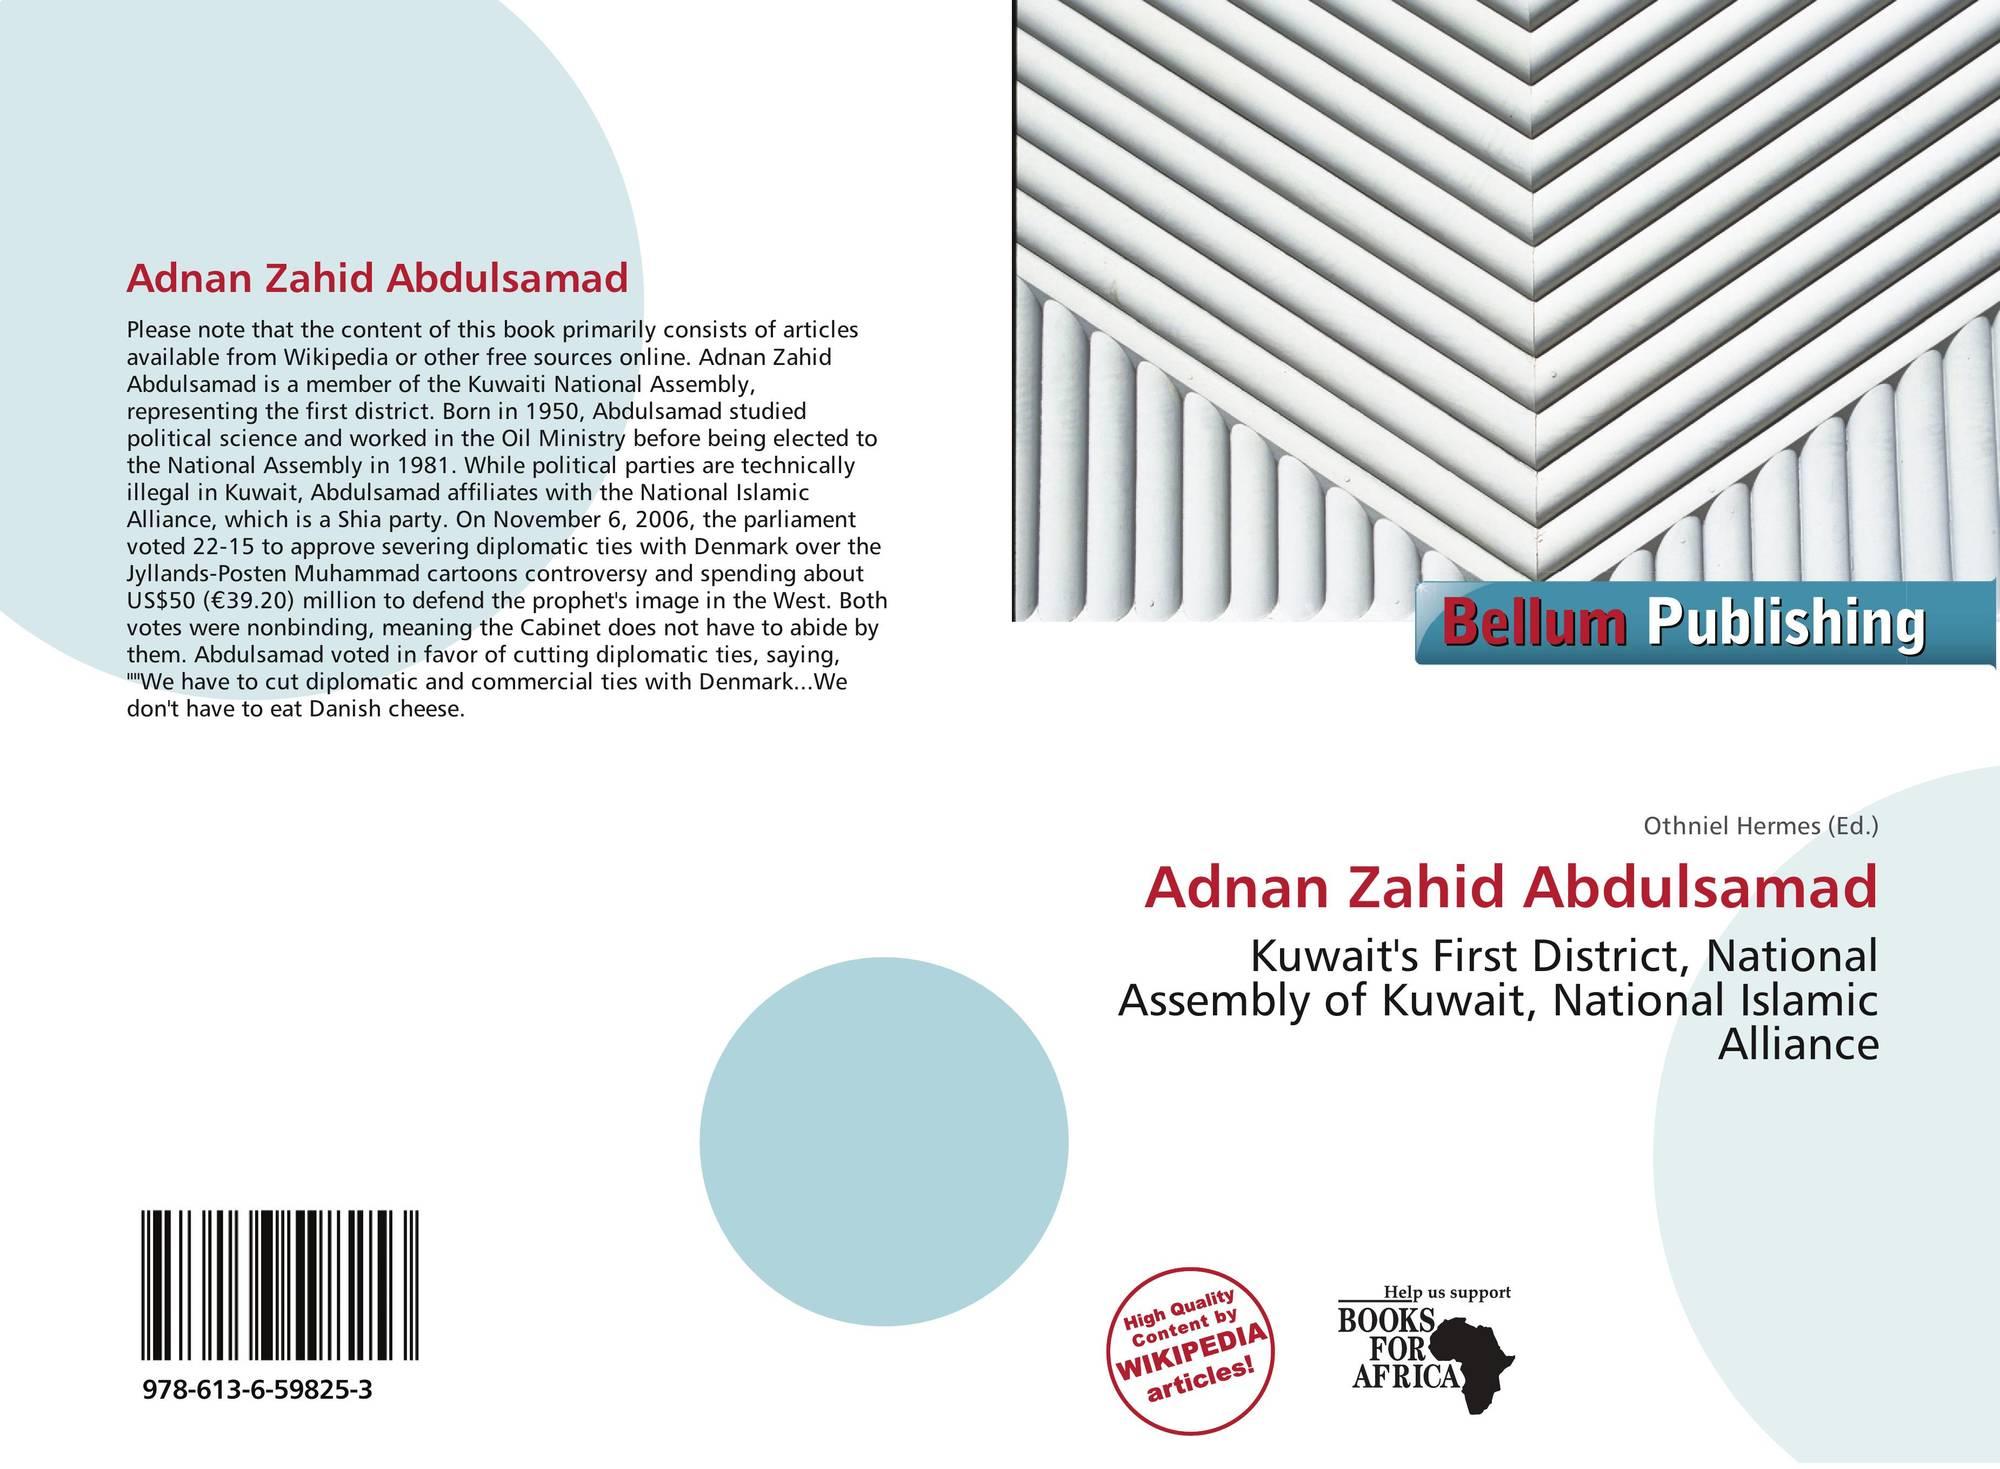 Adnan Zahid Abdulsamad